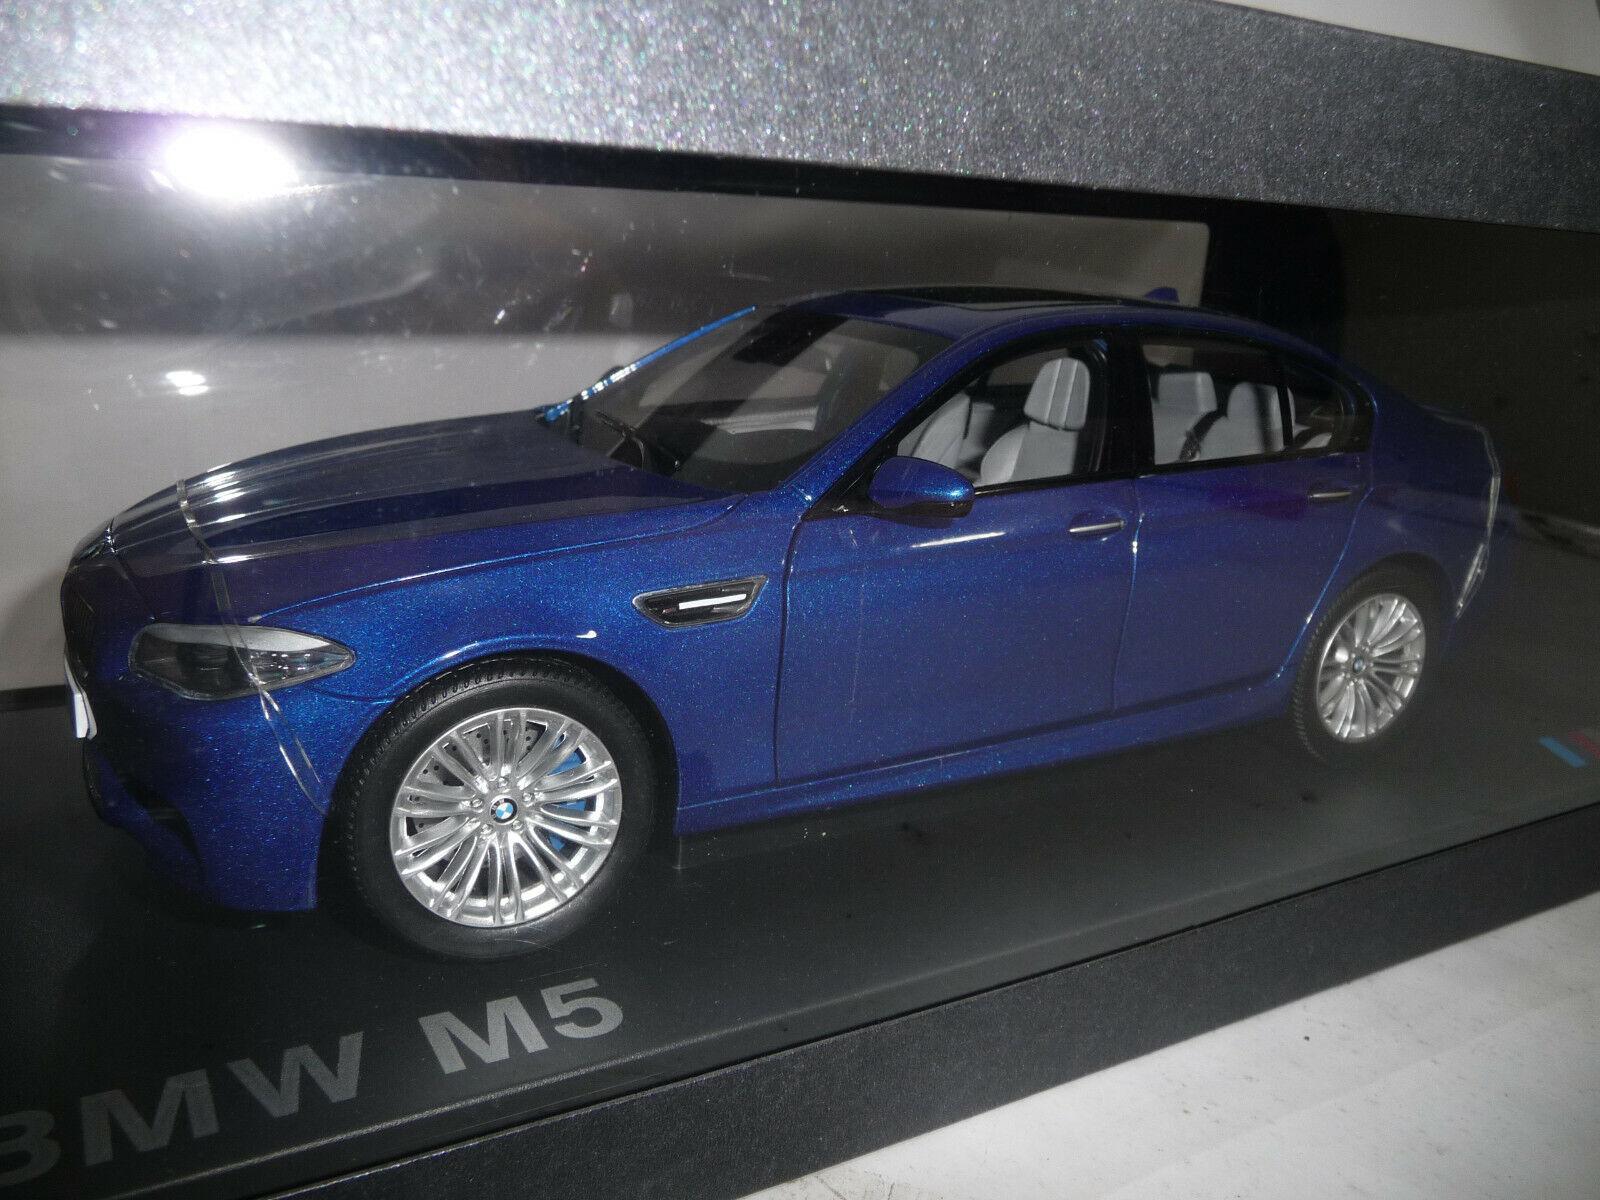 BMW 5er m5 f10 Limousine Monte Carlo Blue 1:18 Paragon spacciatore